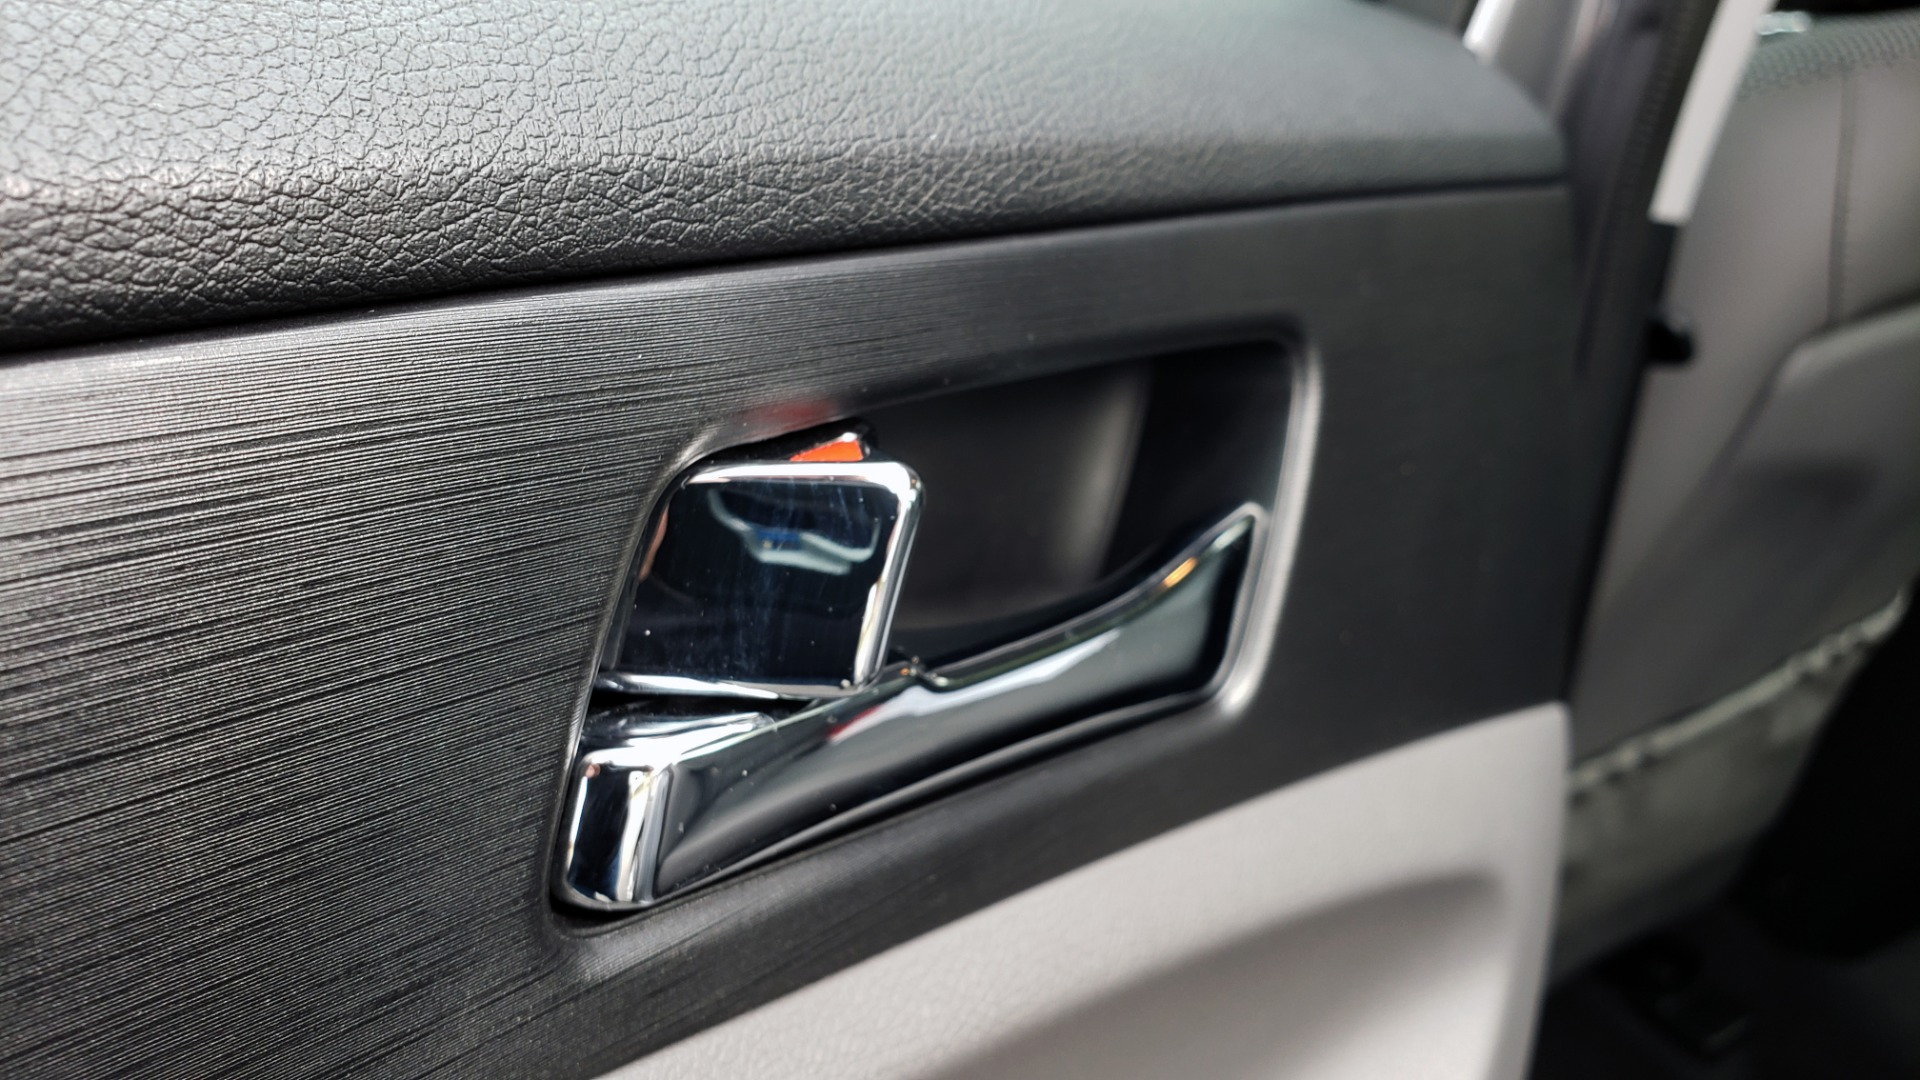 Used 2013 Hyundai SONATA SE AUTO / 2.4L 4-CYL / 6-SPD AUTO / VERY CLEAN for sale Sold at Formula Imports in Charlotte NC 28227 54